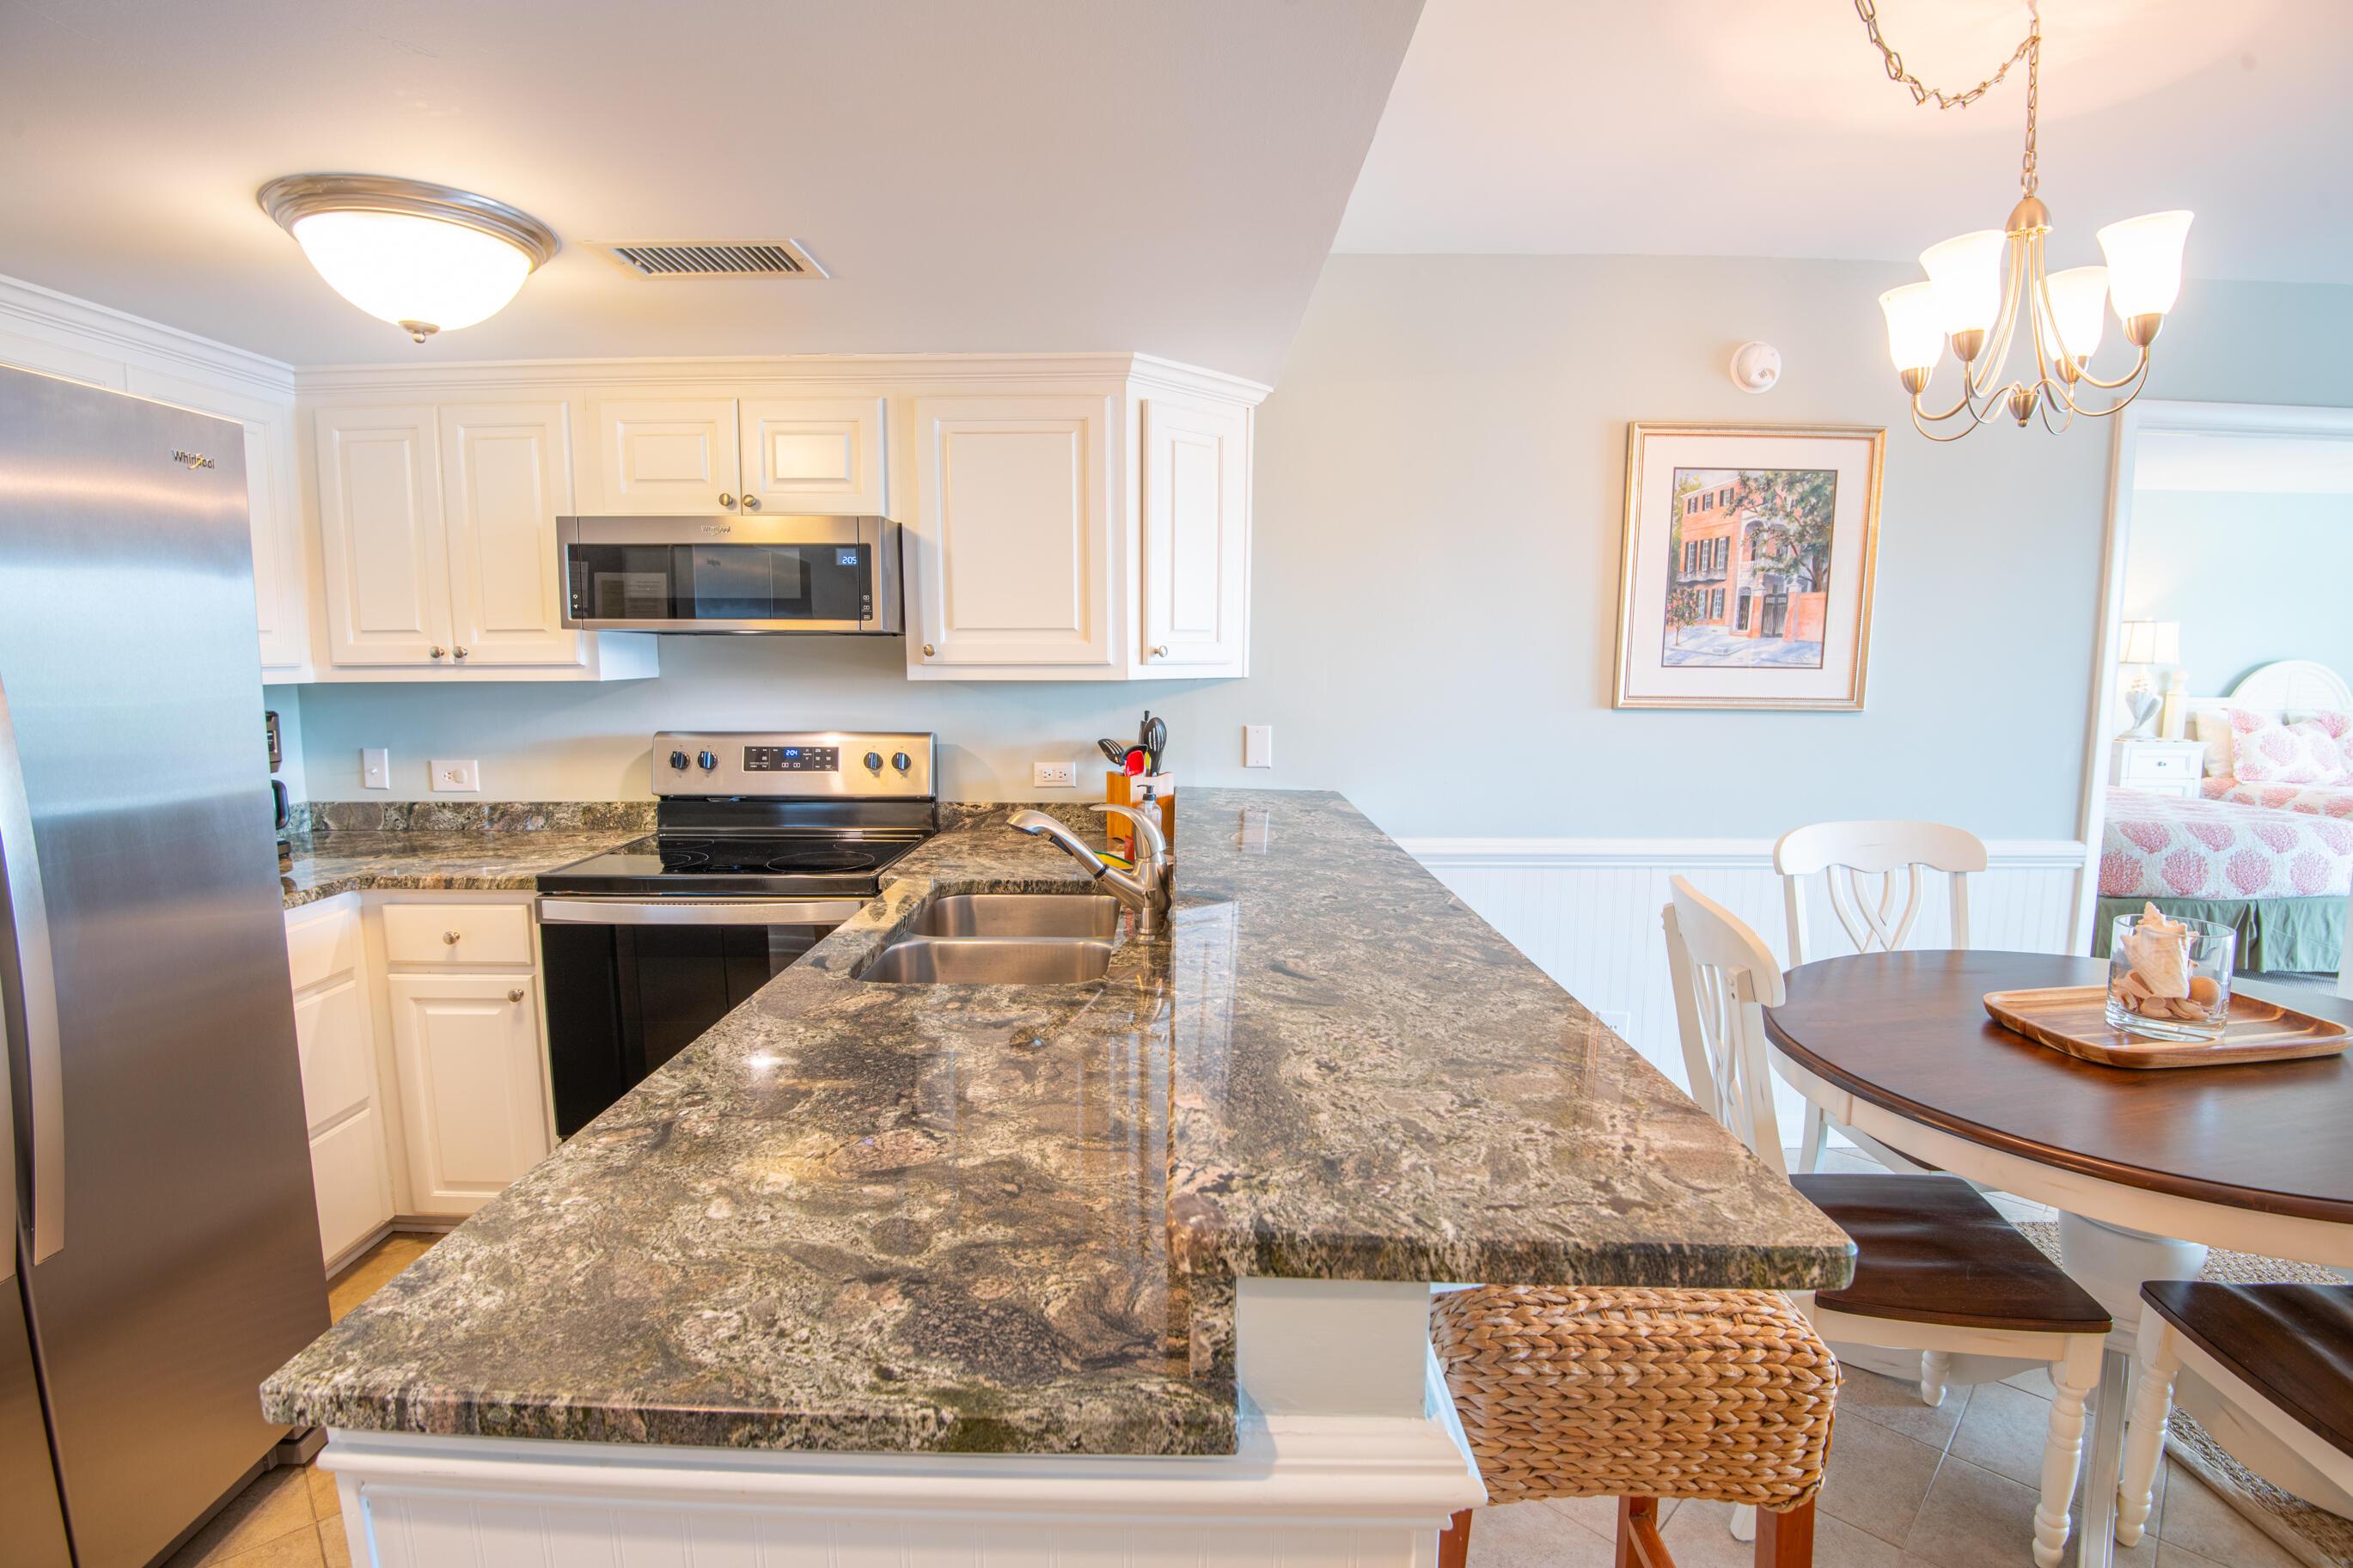 Atrium Villas Homes For Sale - 2935 Atrium Villa, Seabrook Island, SC - 4